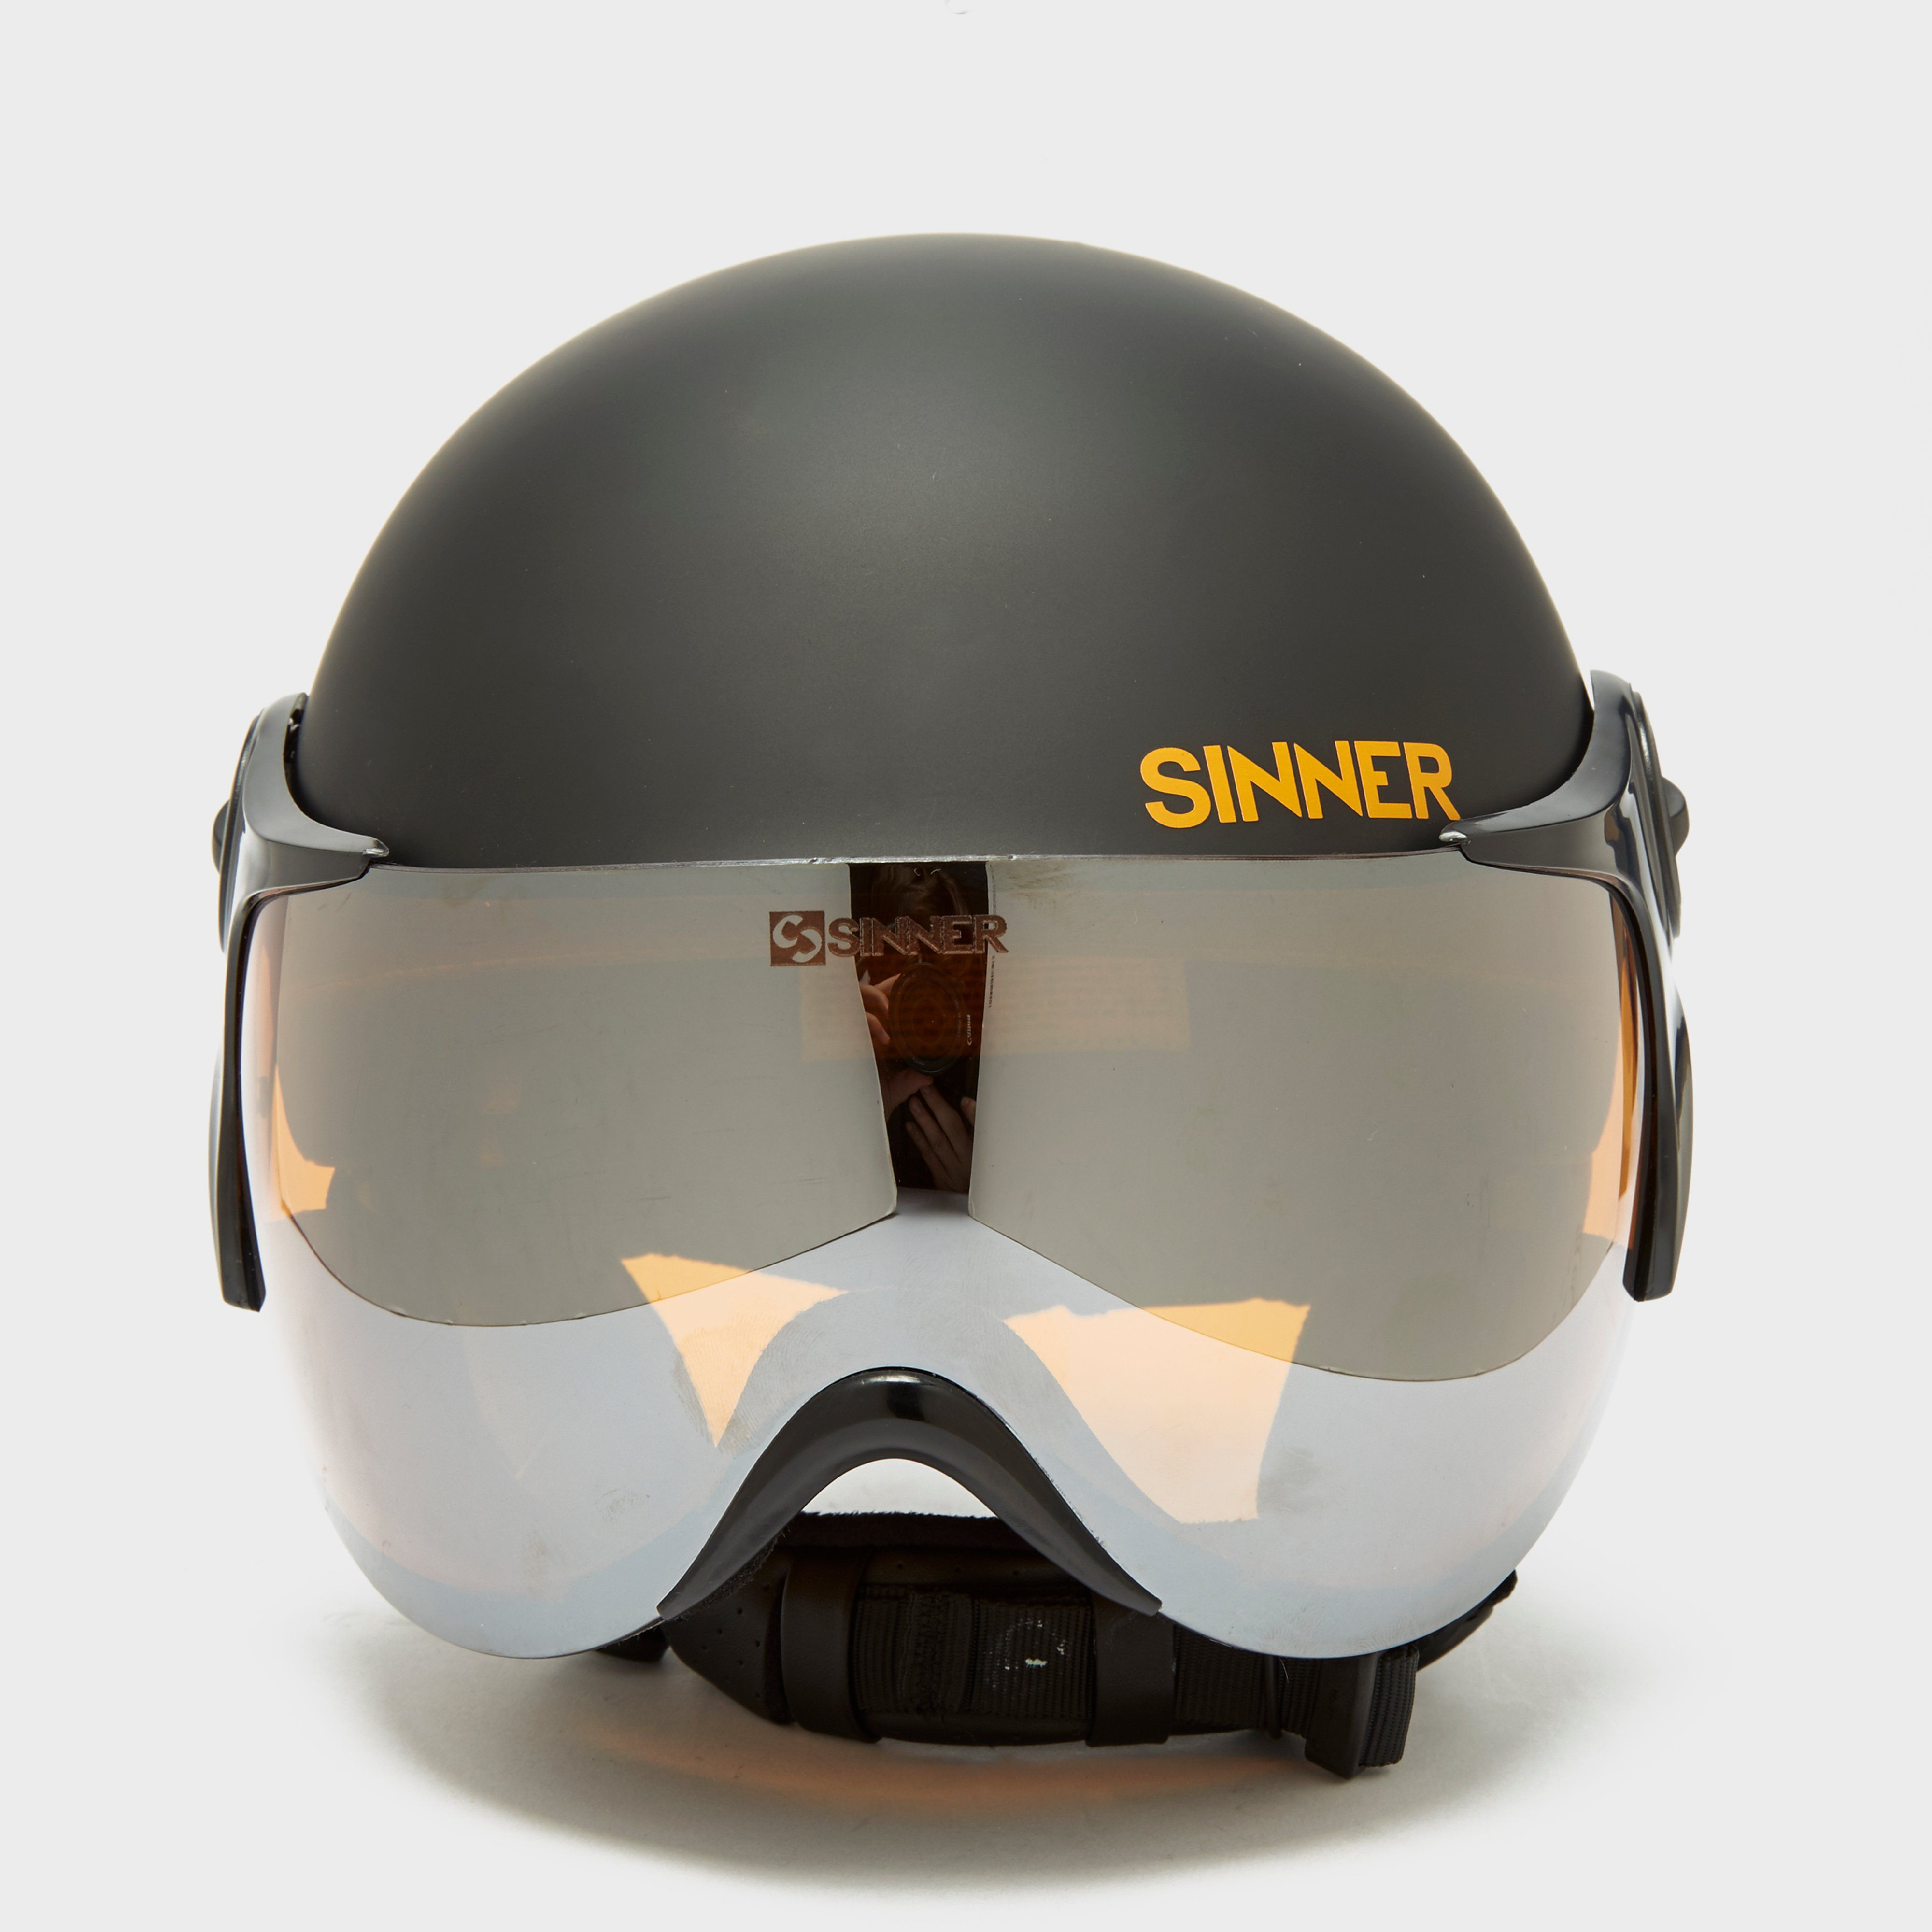 SINNER Crystal Visor Helmet